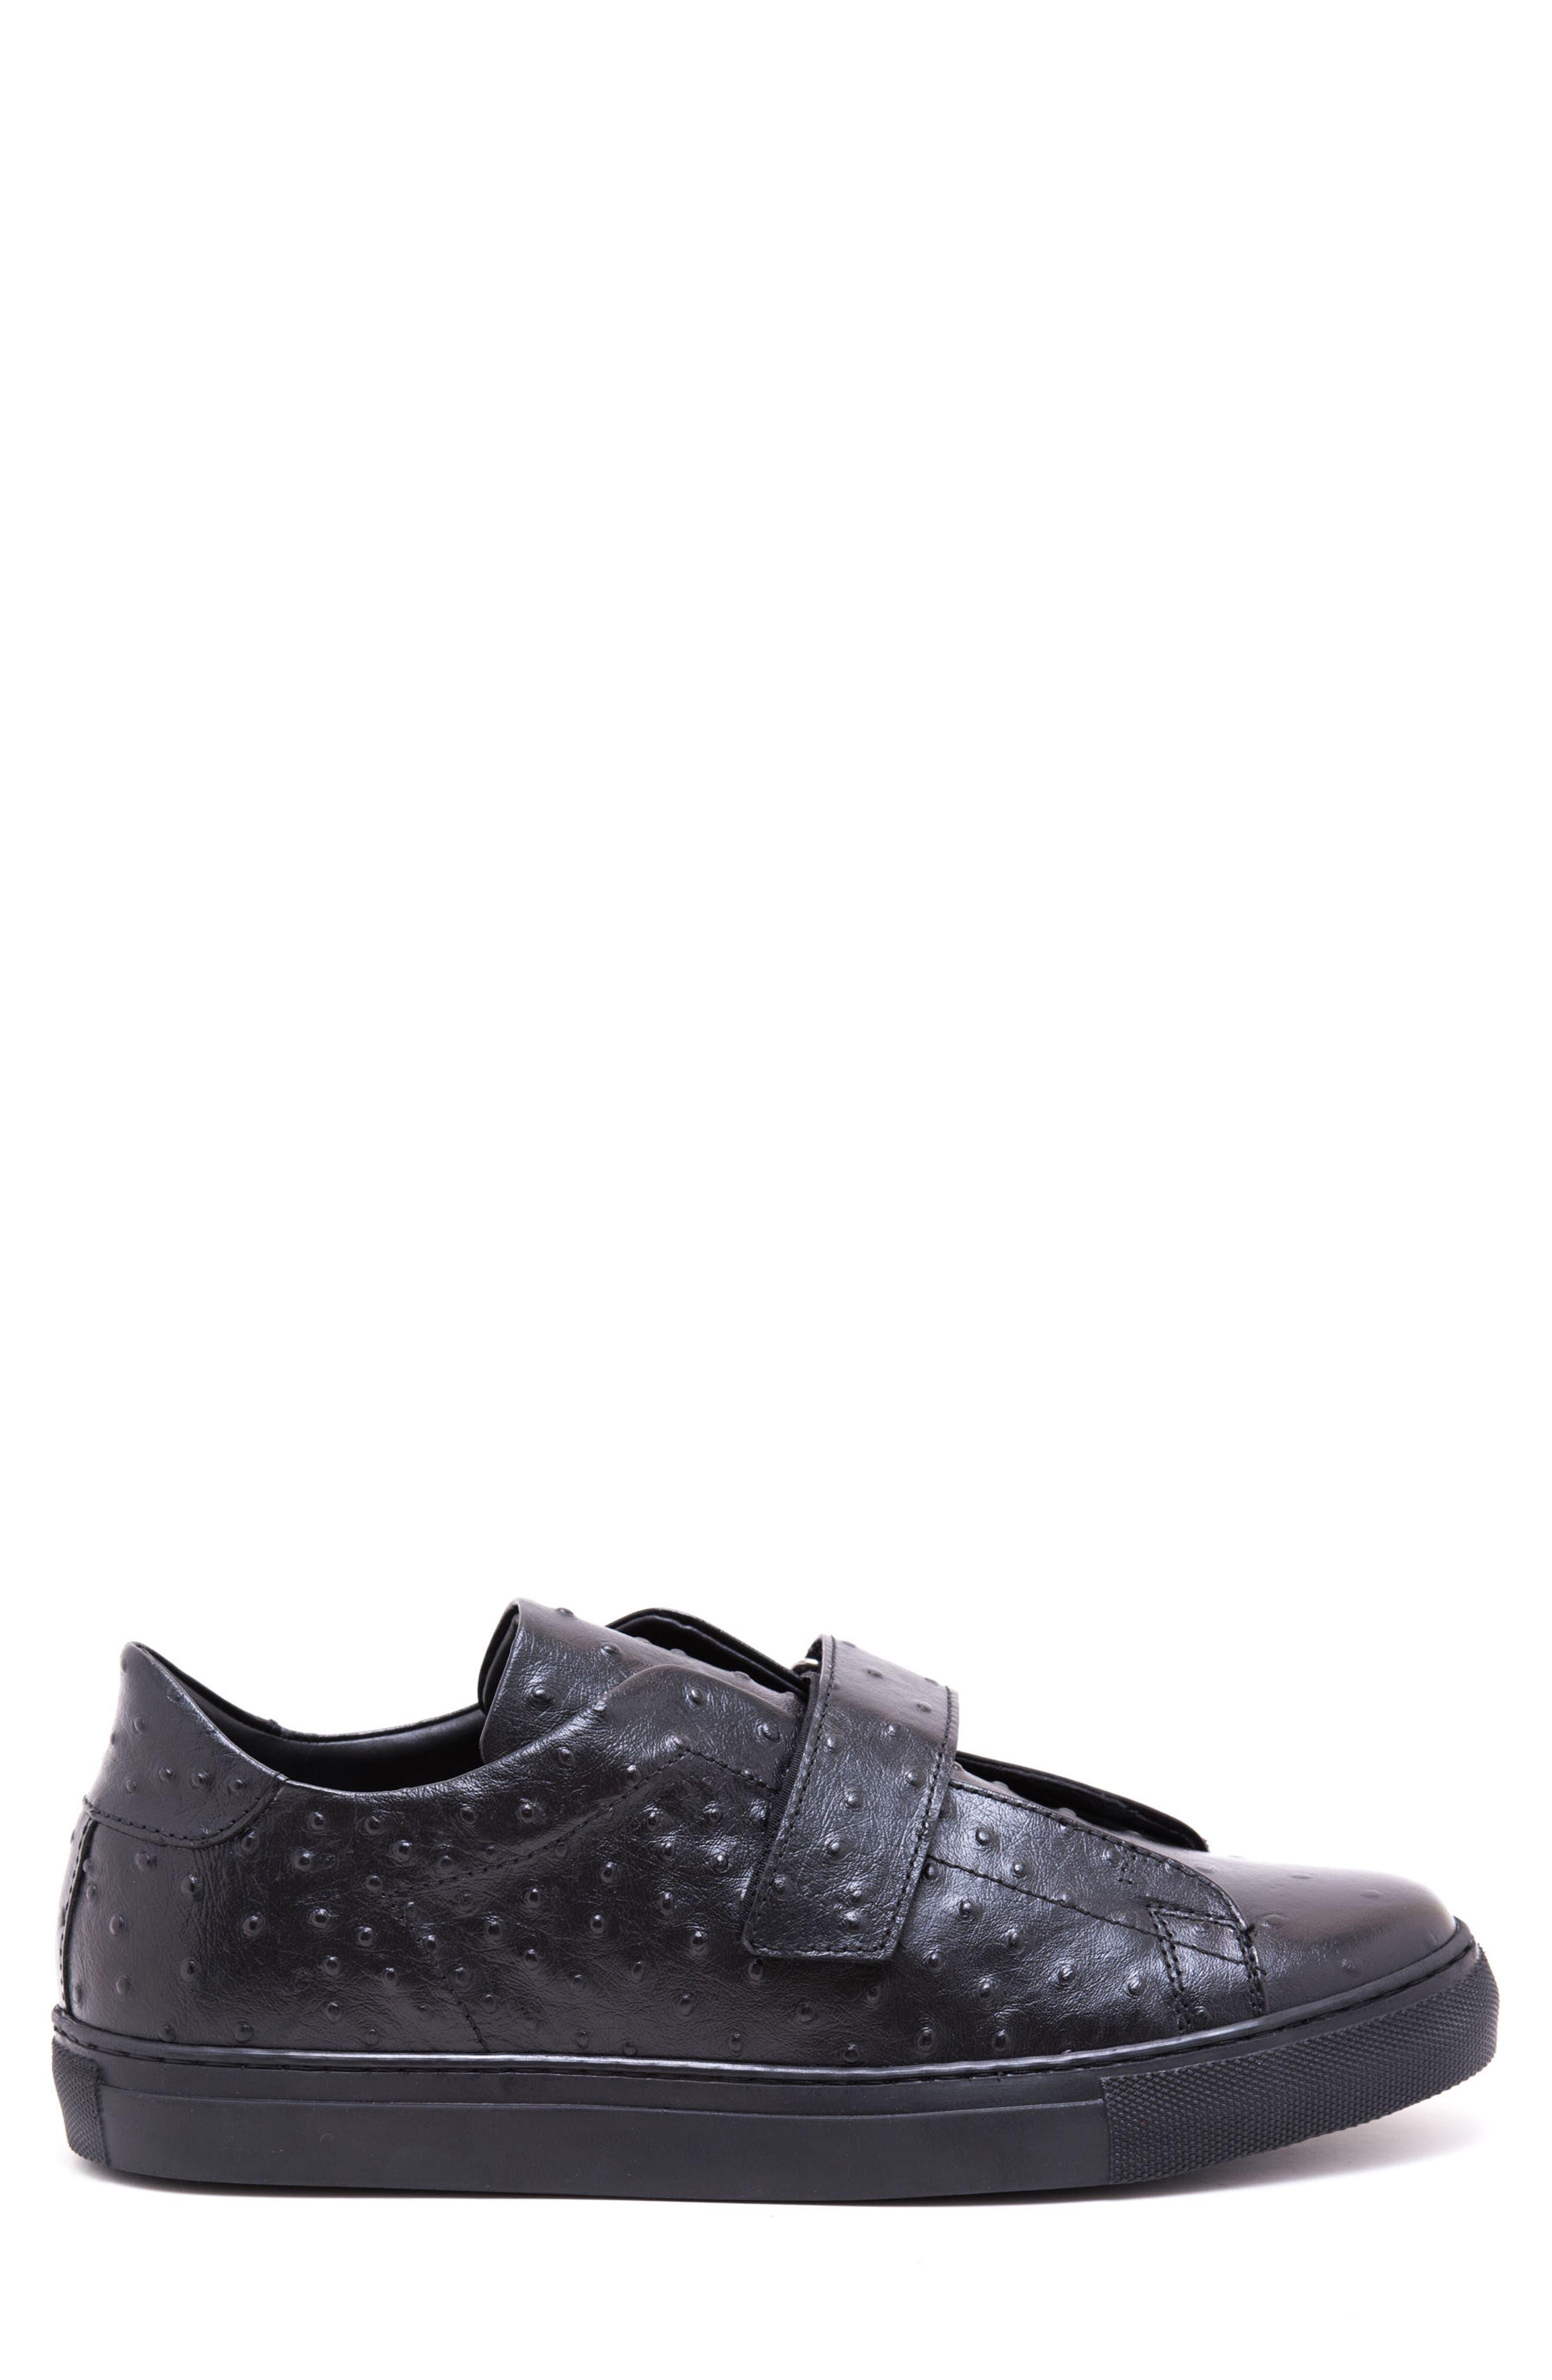 West Sneaker,                             Alternate thumbnail 3, color,                             BLACK